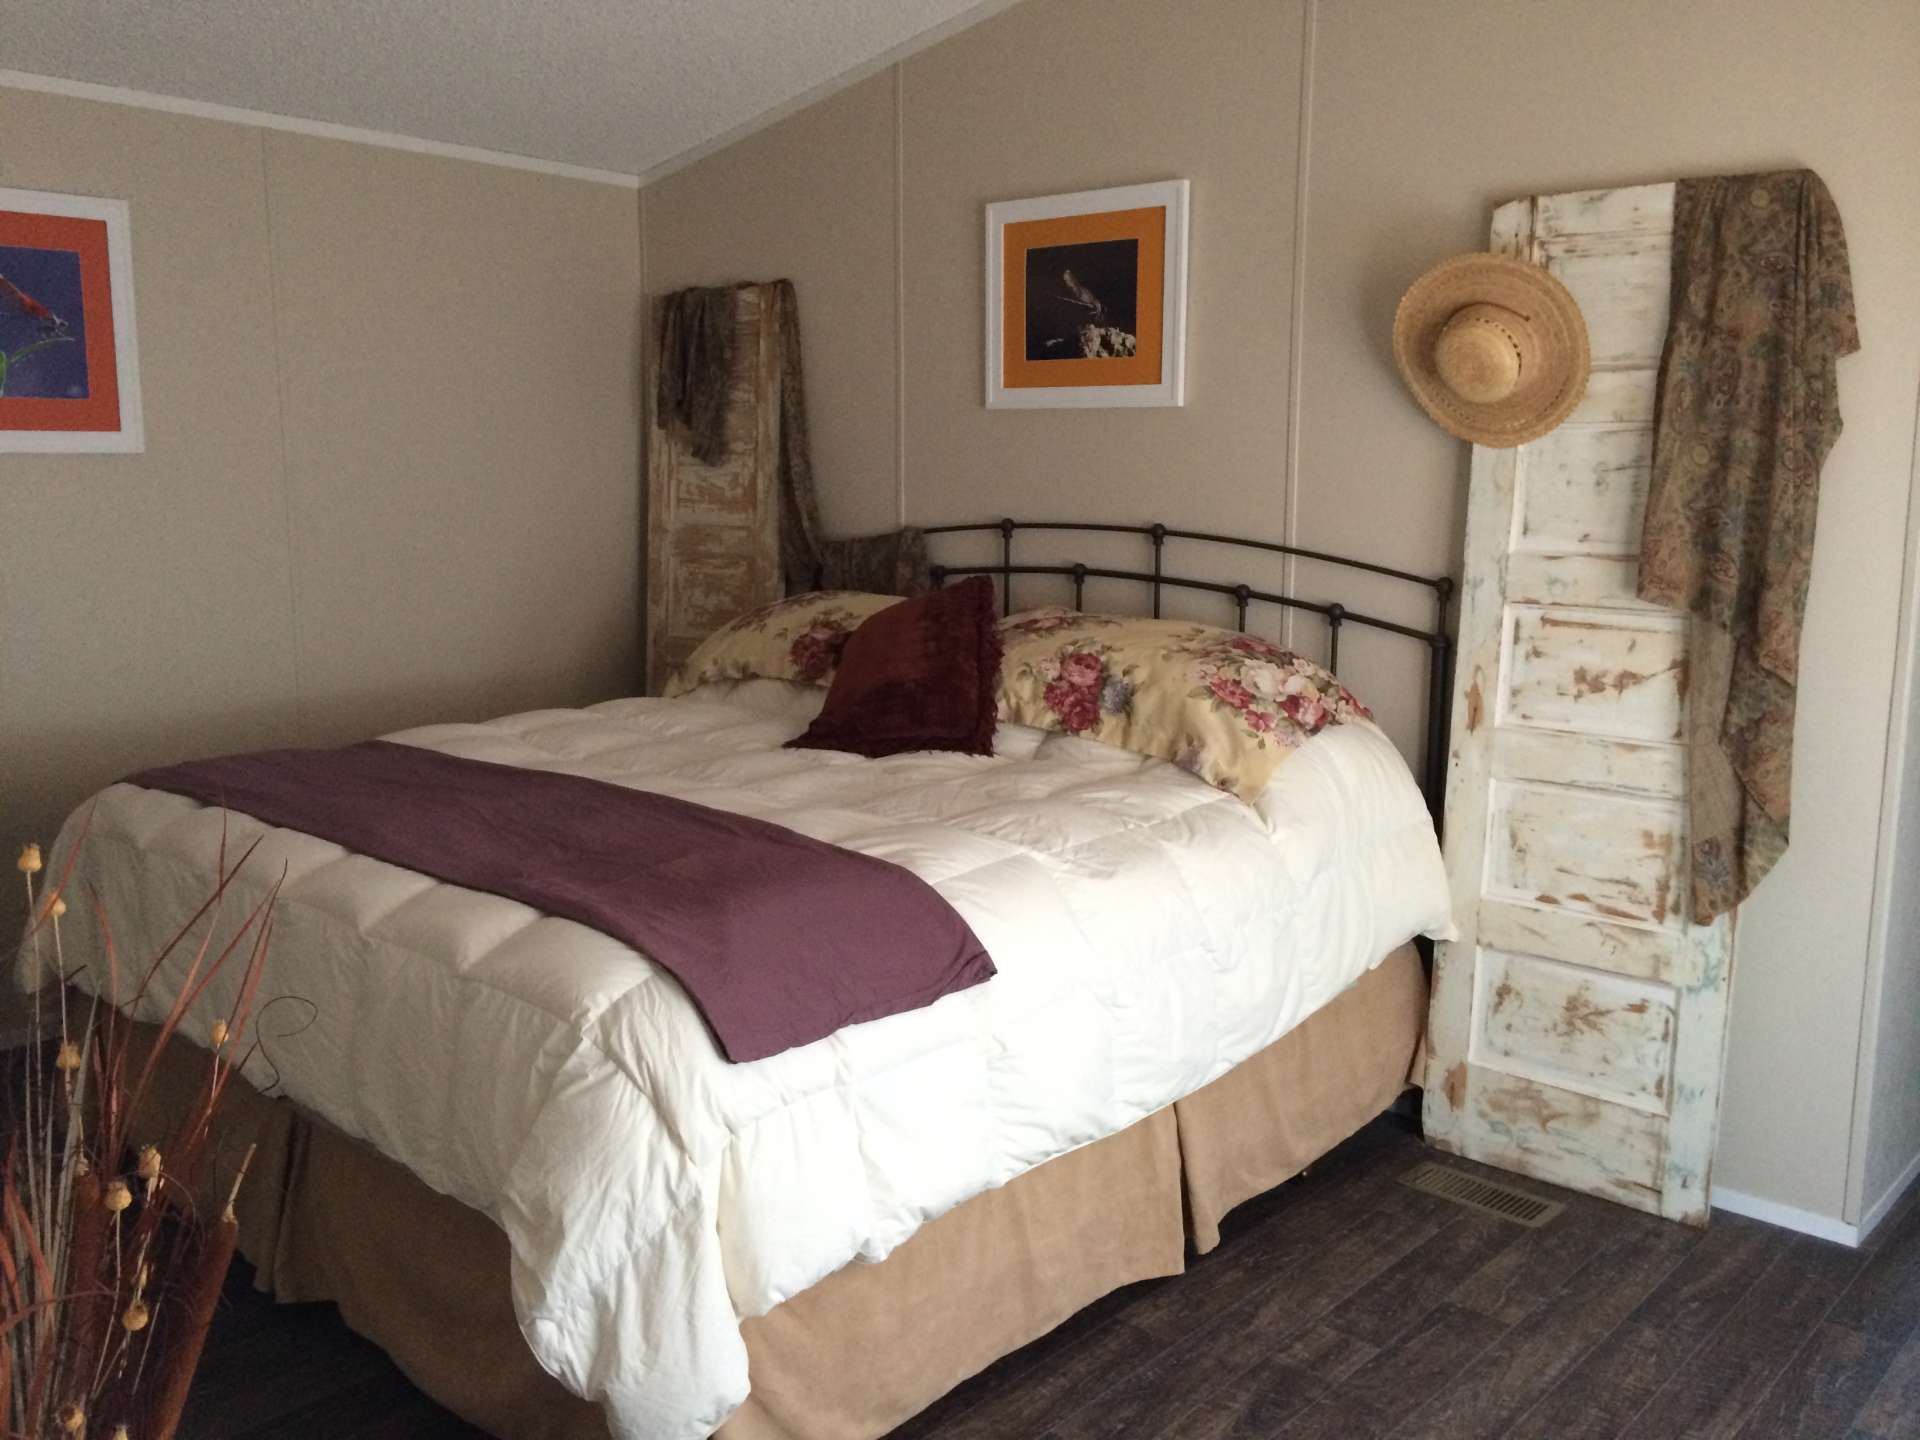 cabin master bedroom, king size room, cabin lodging